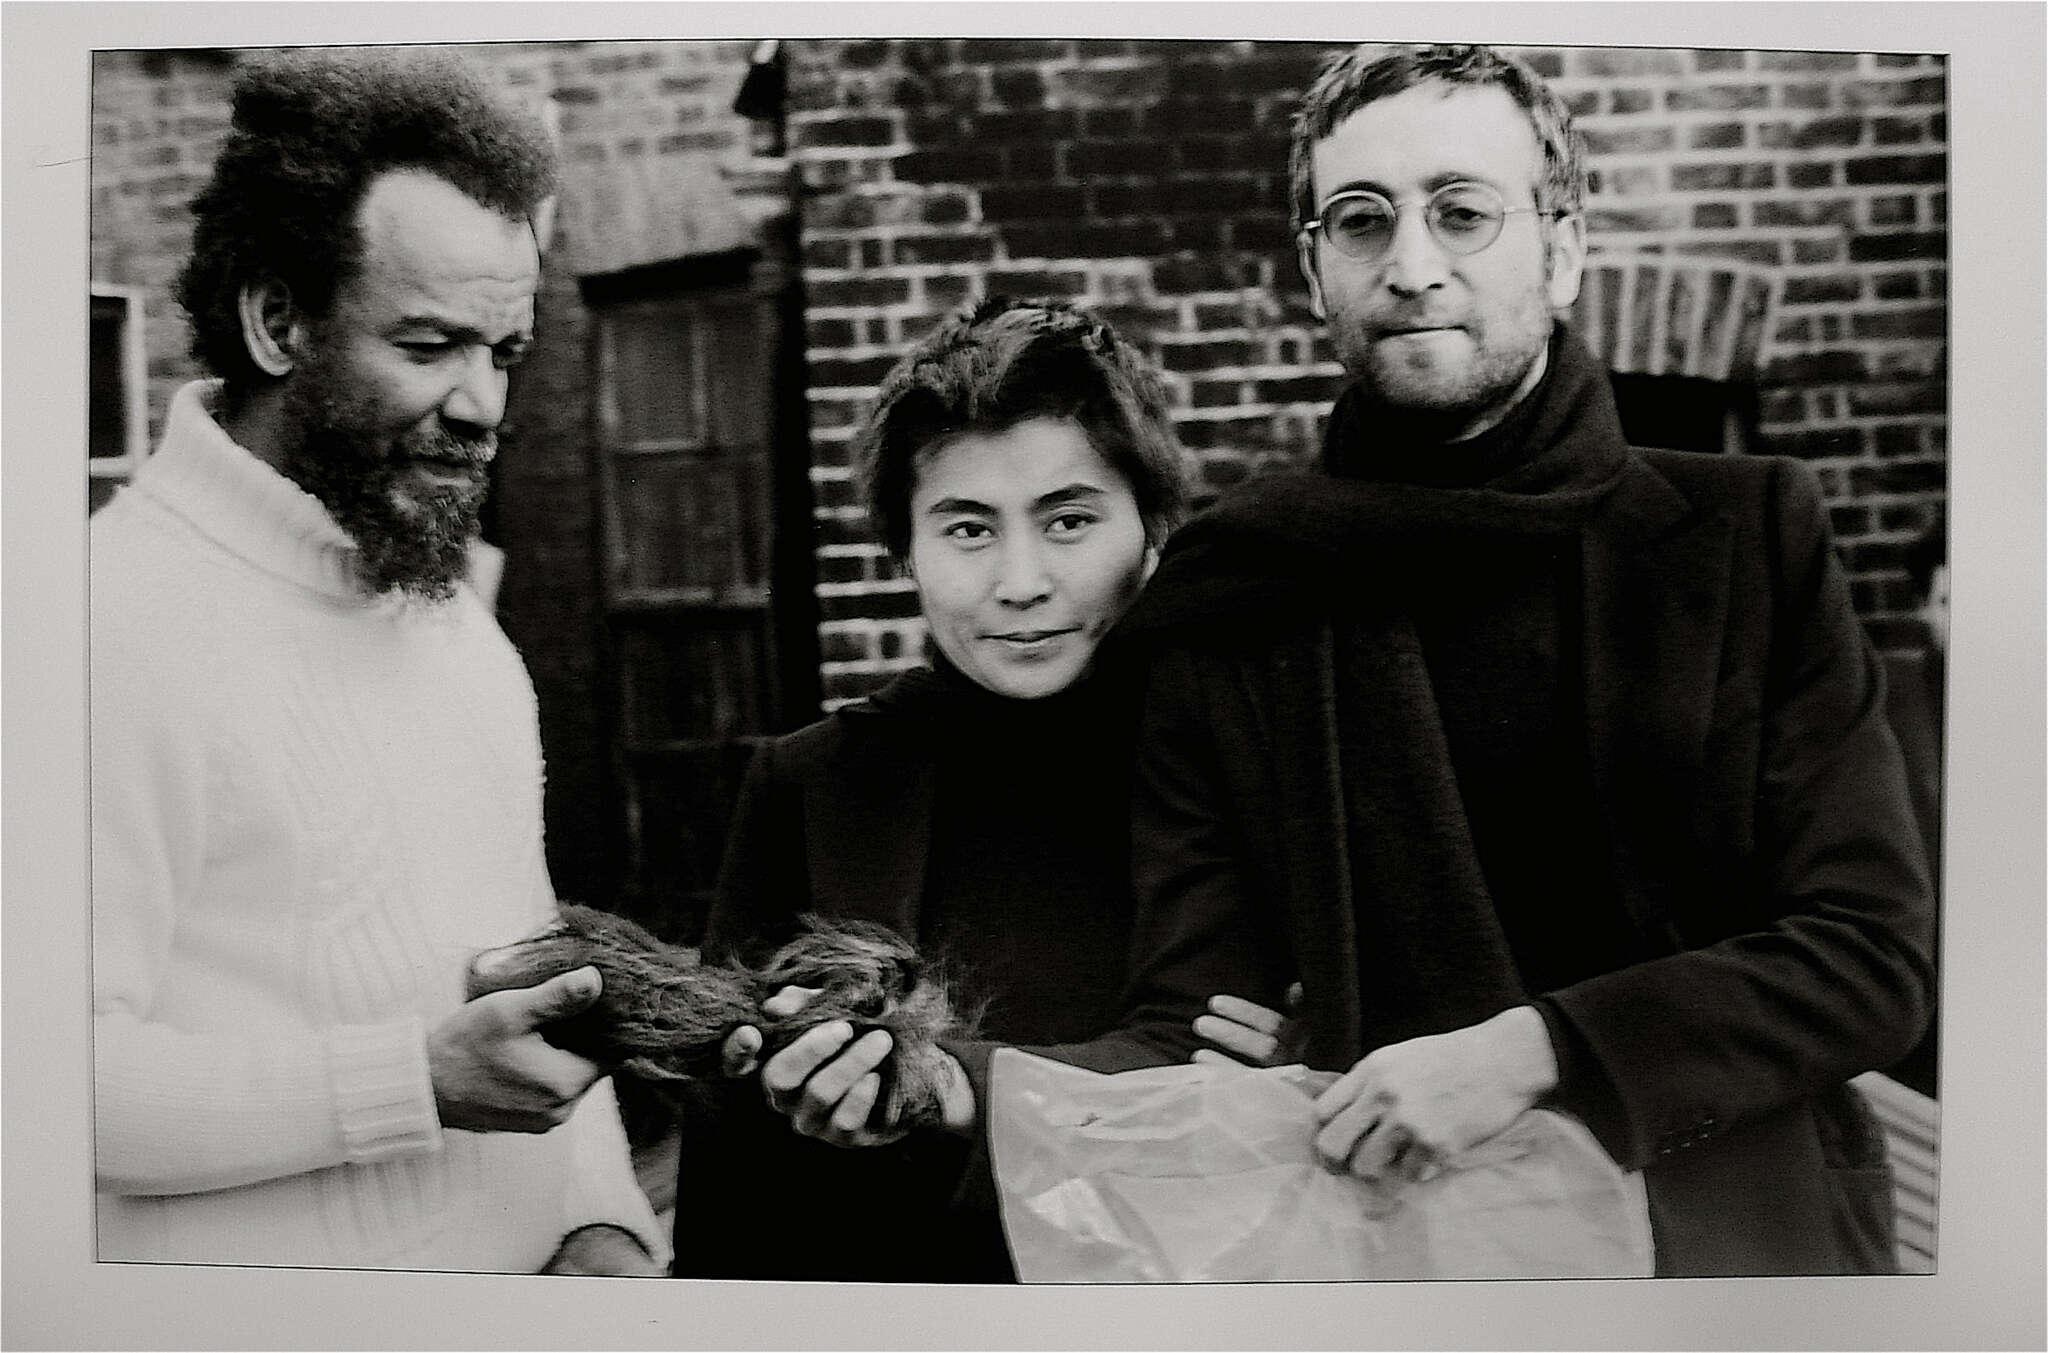 Horace Ové, 'John Lennon giving Michael X his hair to auction, 1969'artist